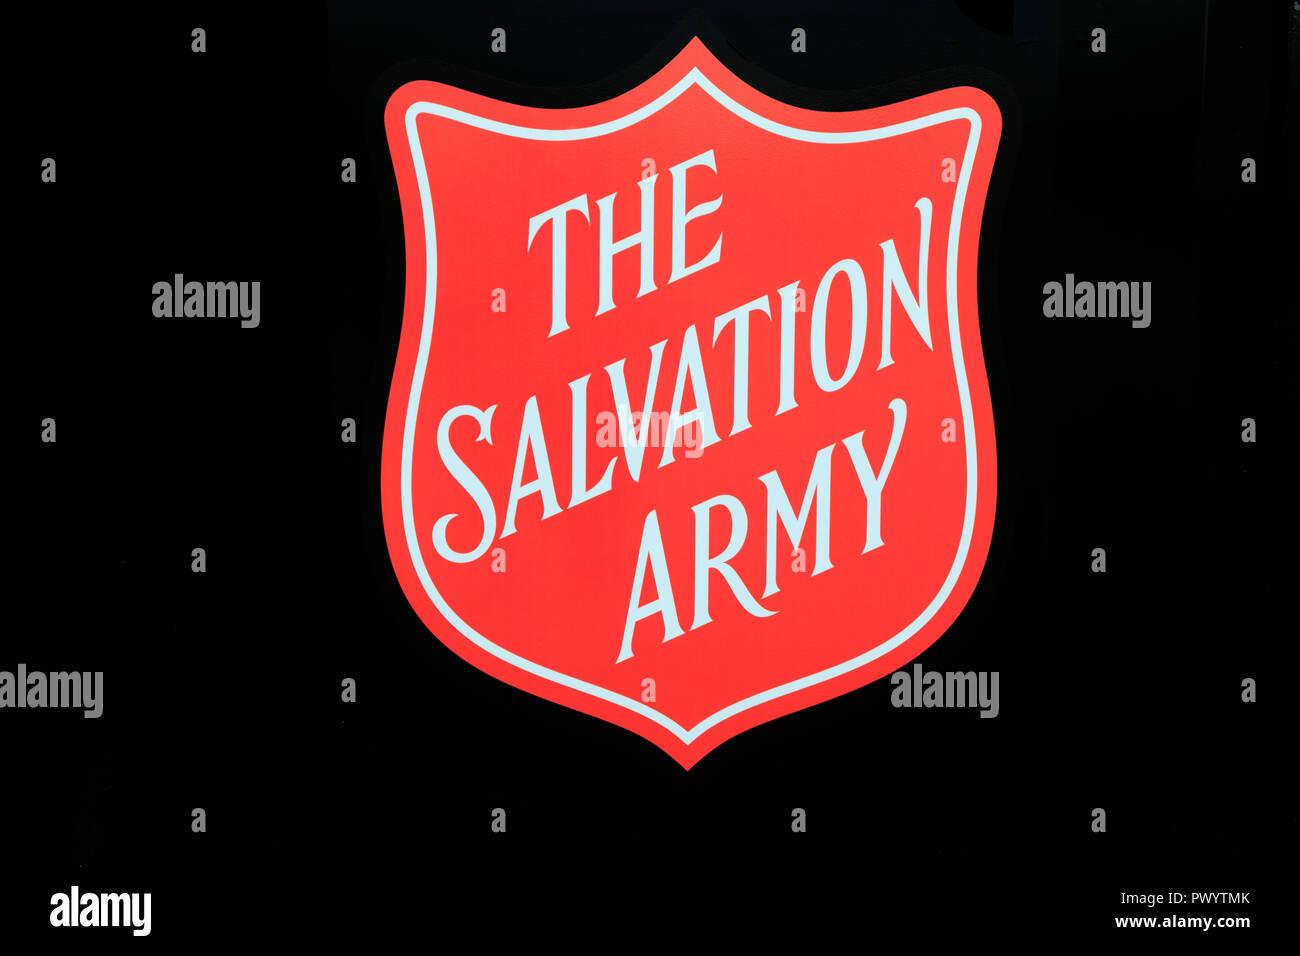 The Salvation Army, logo, badge, England, UK - Stock Image